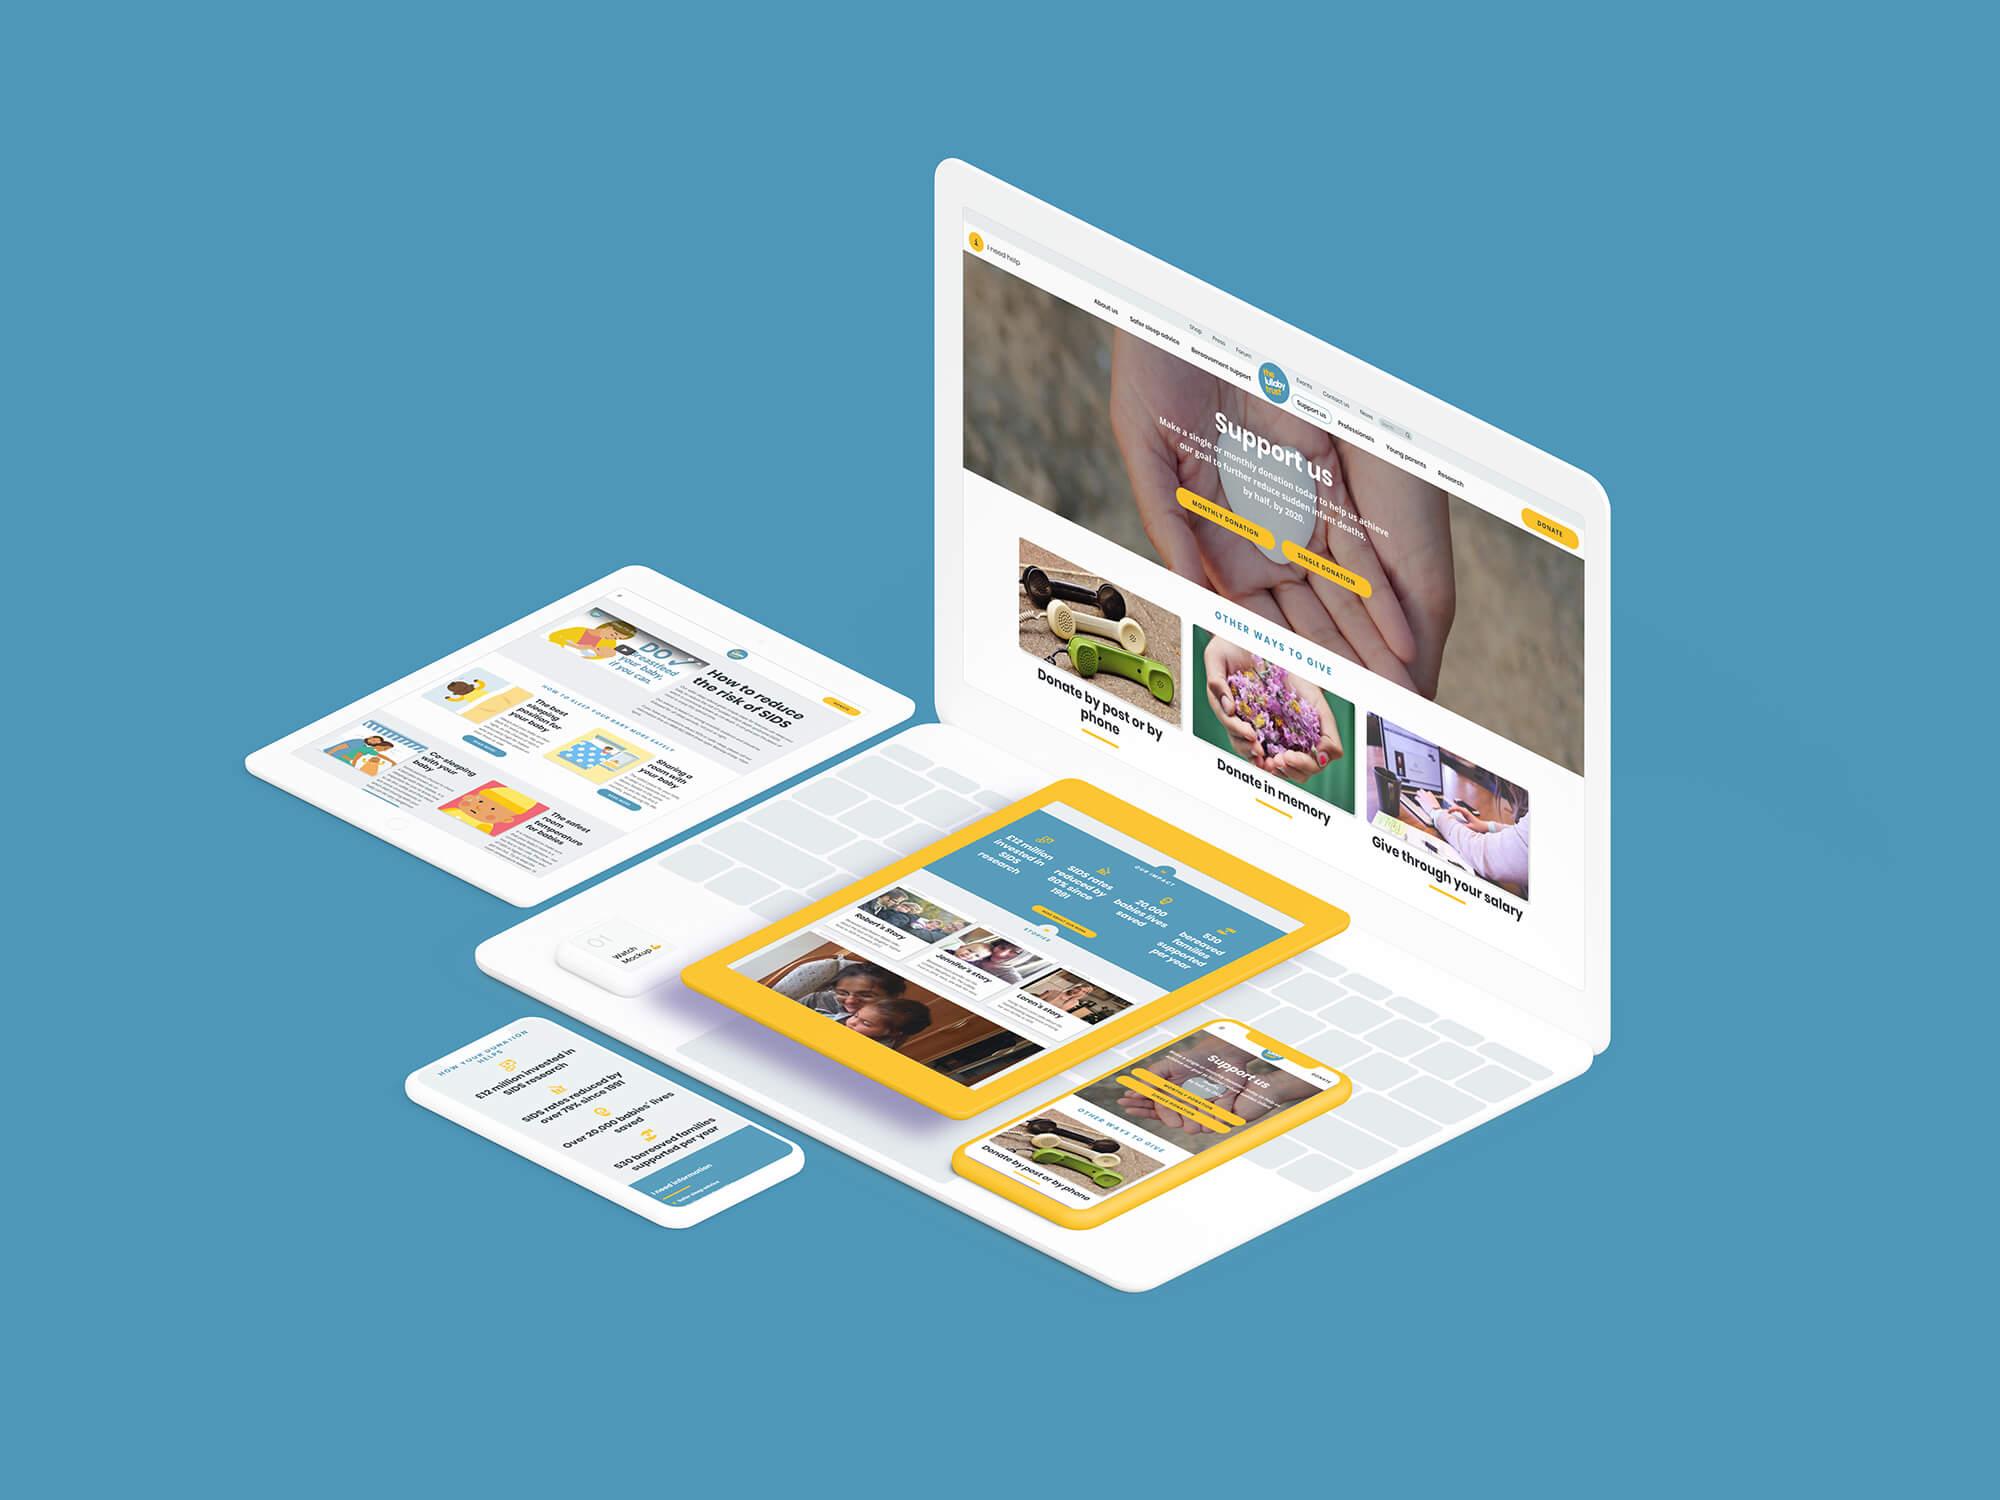 Lullaby trust website design